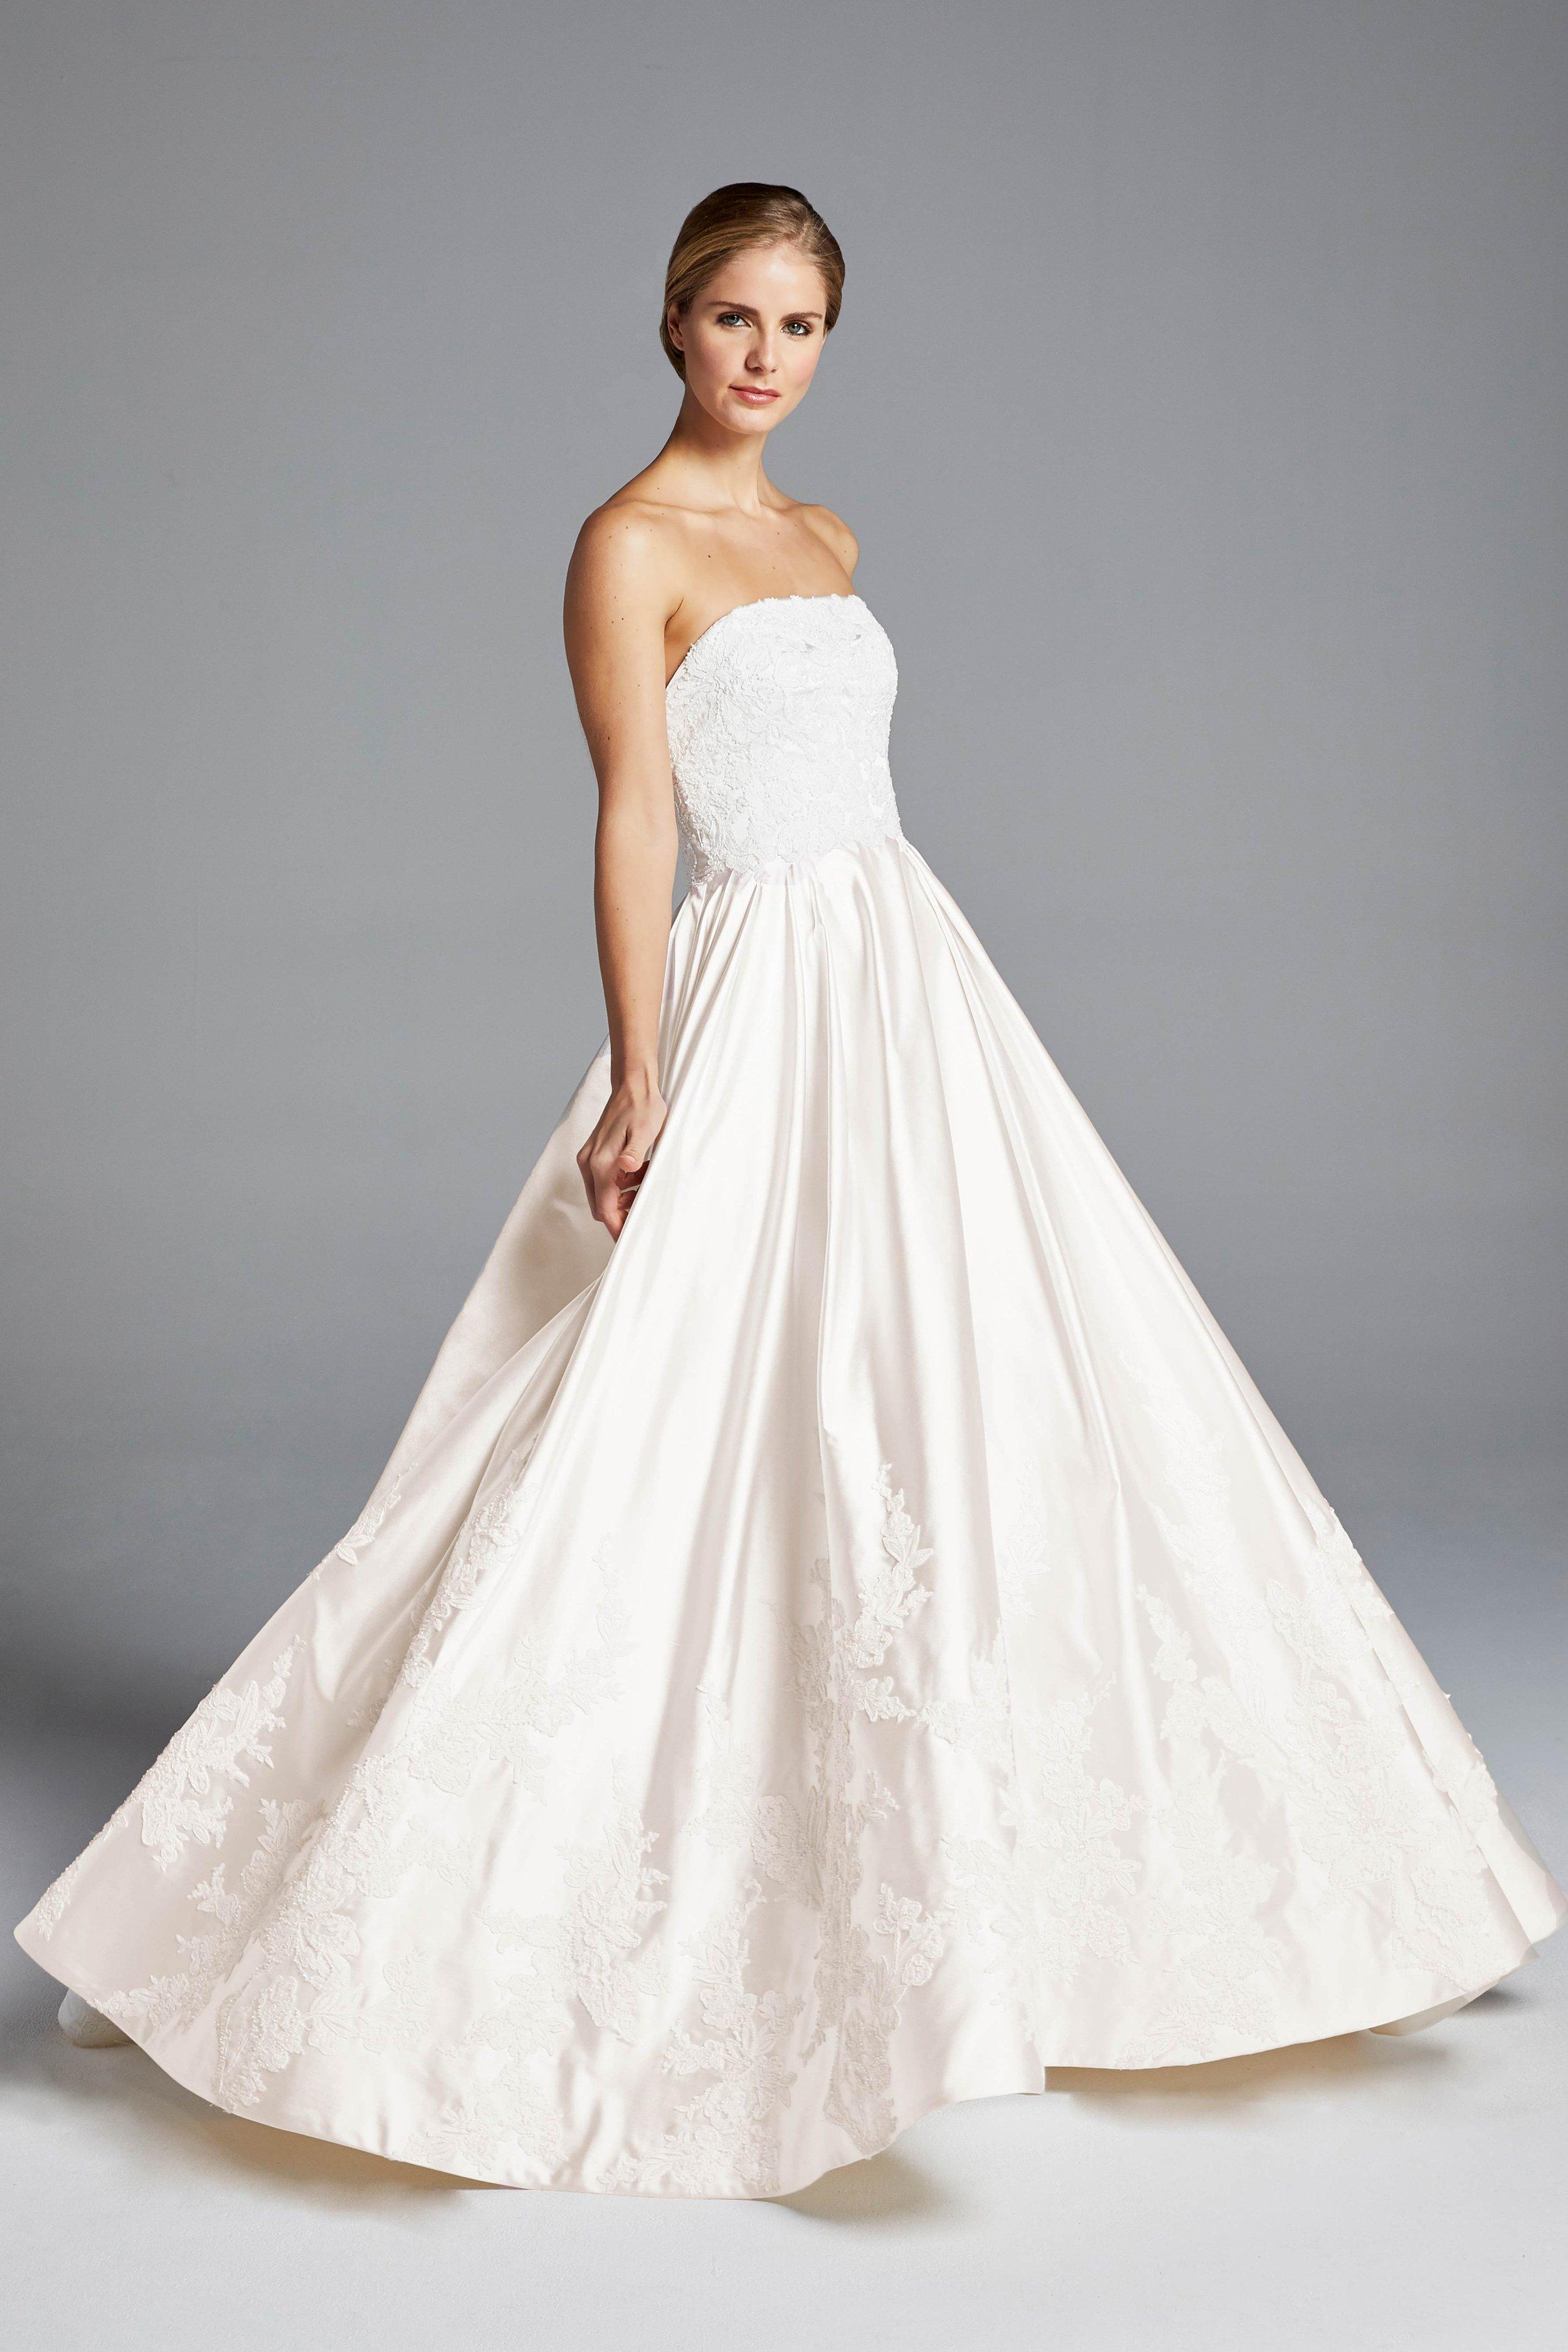 AB_MICHELLE_FRONT_VOGUE-spring-2019-bridal.jpg